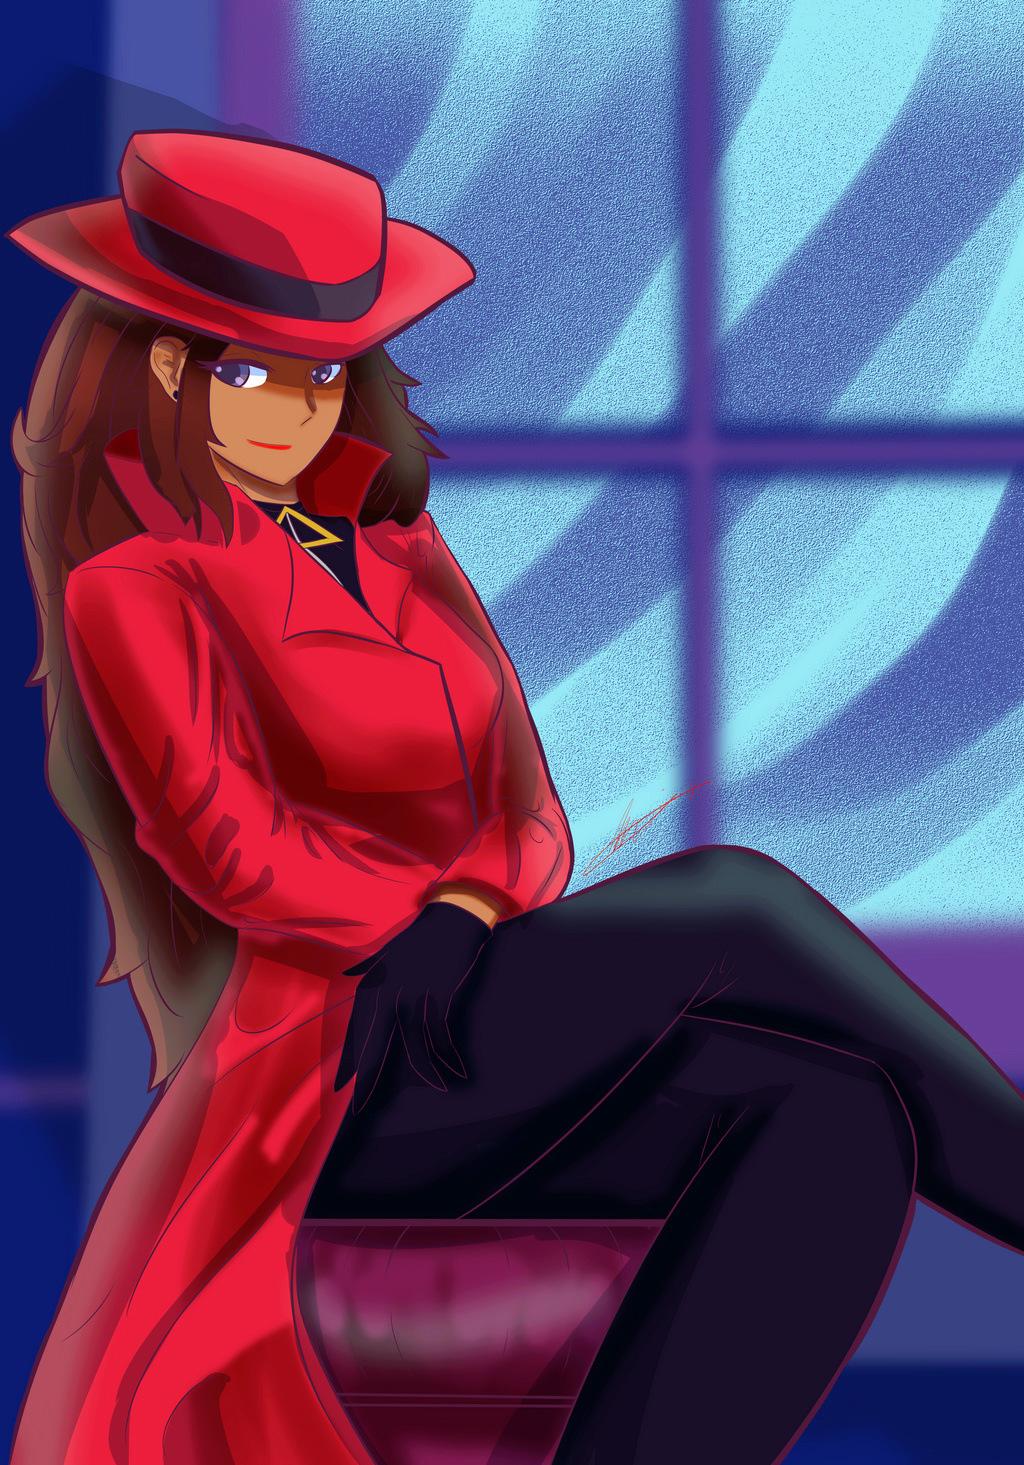 Carmen sandiego Fanart10